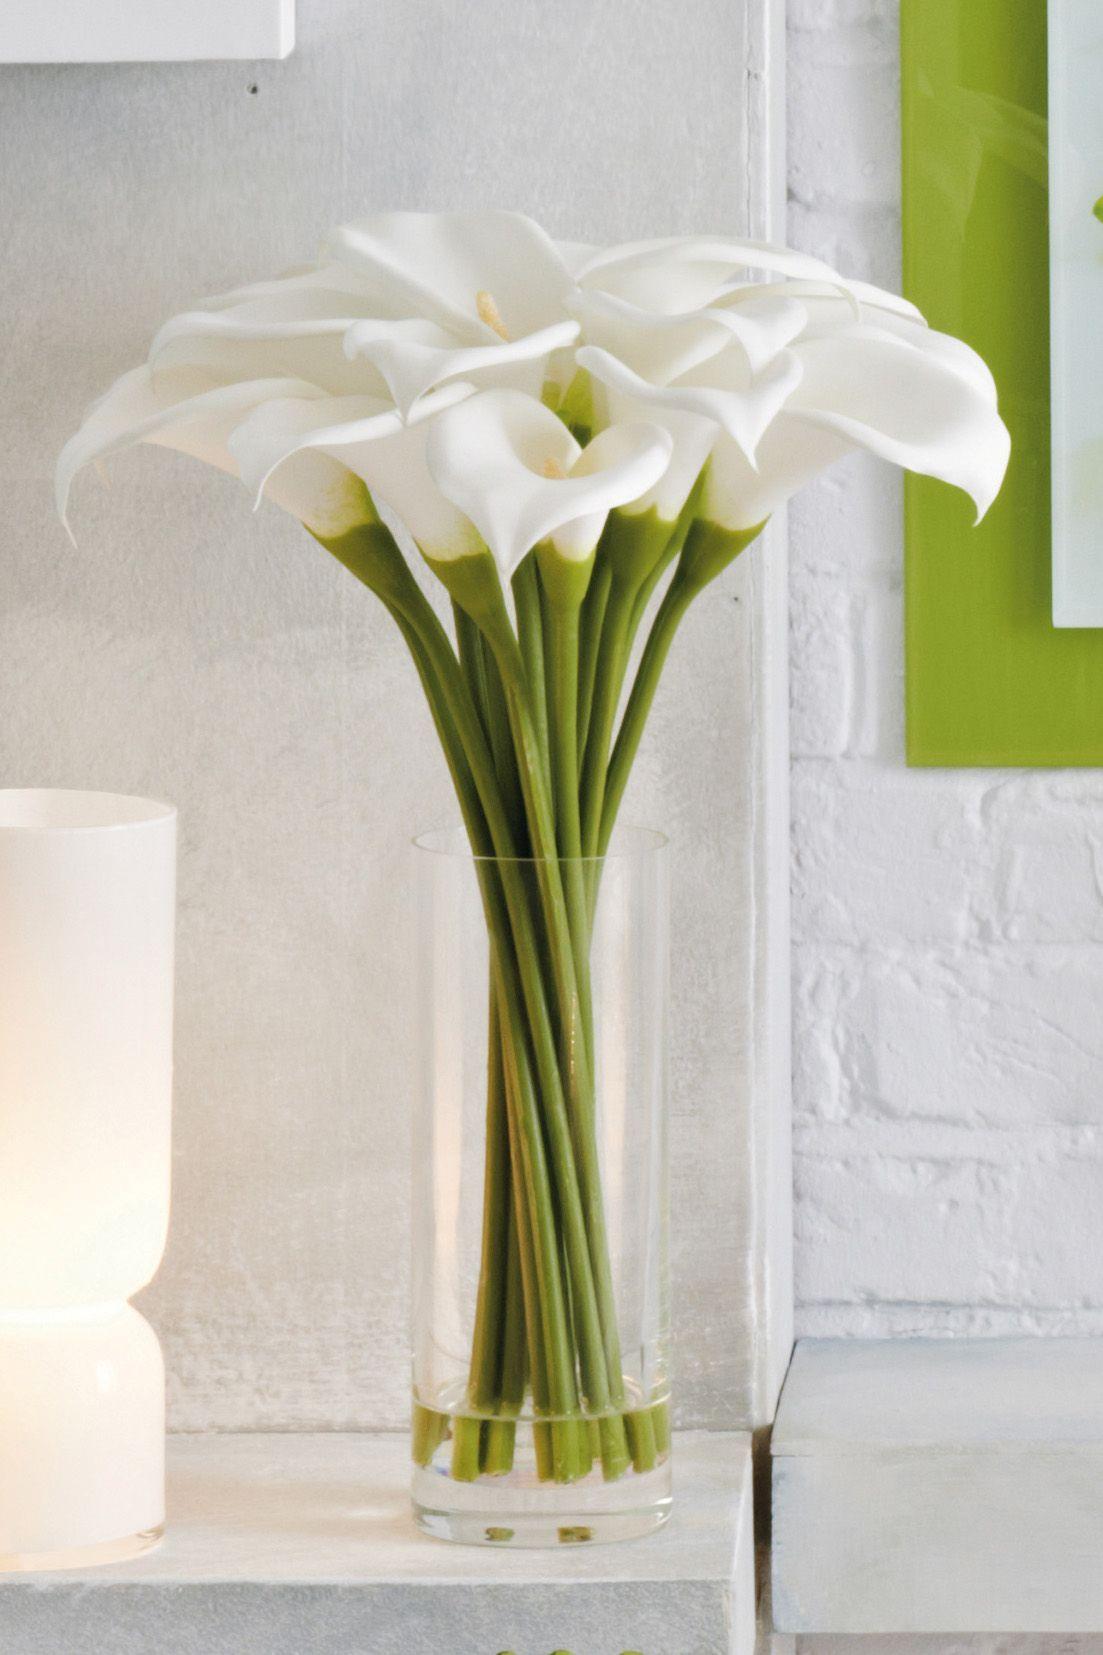 Calla Lilies by Next.co.uk Calla lily centerpieces, Fake